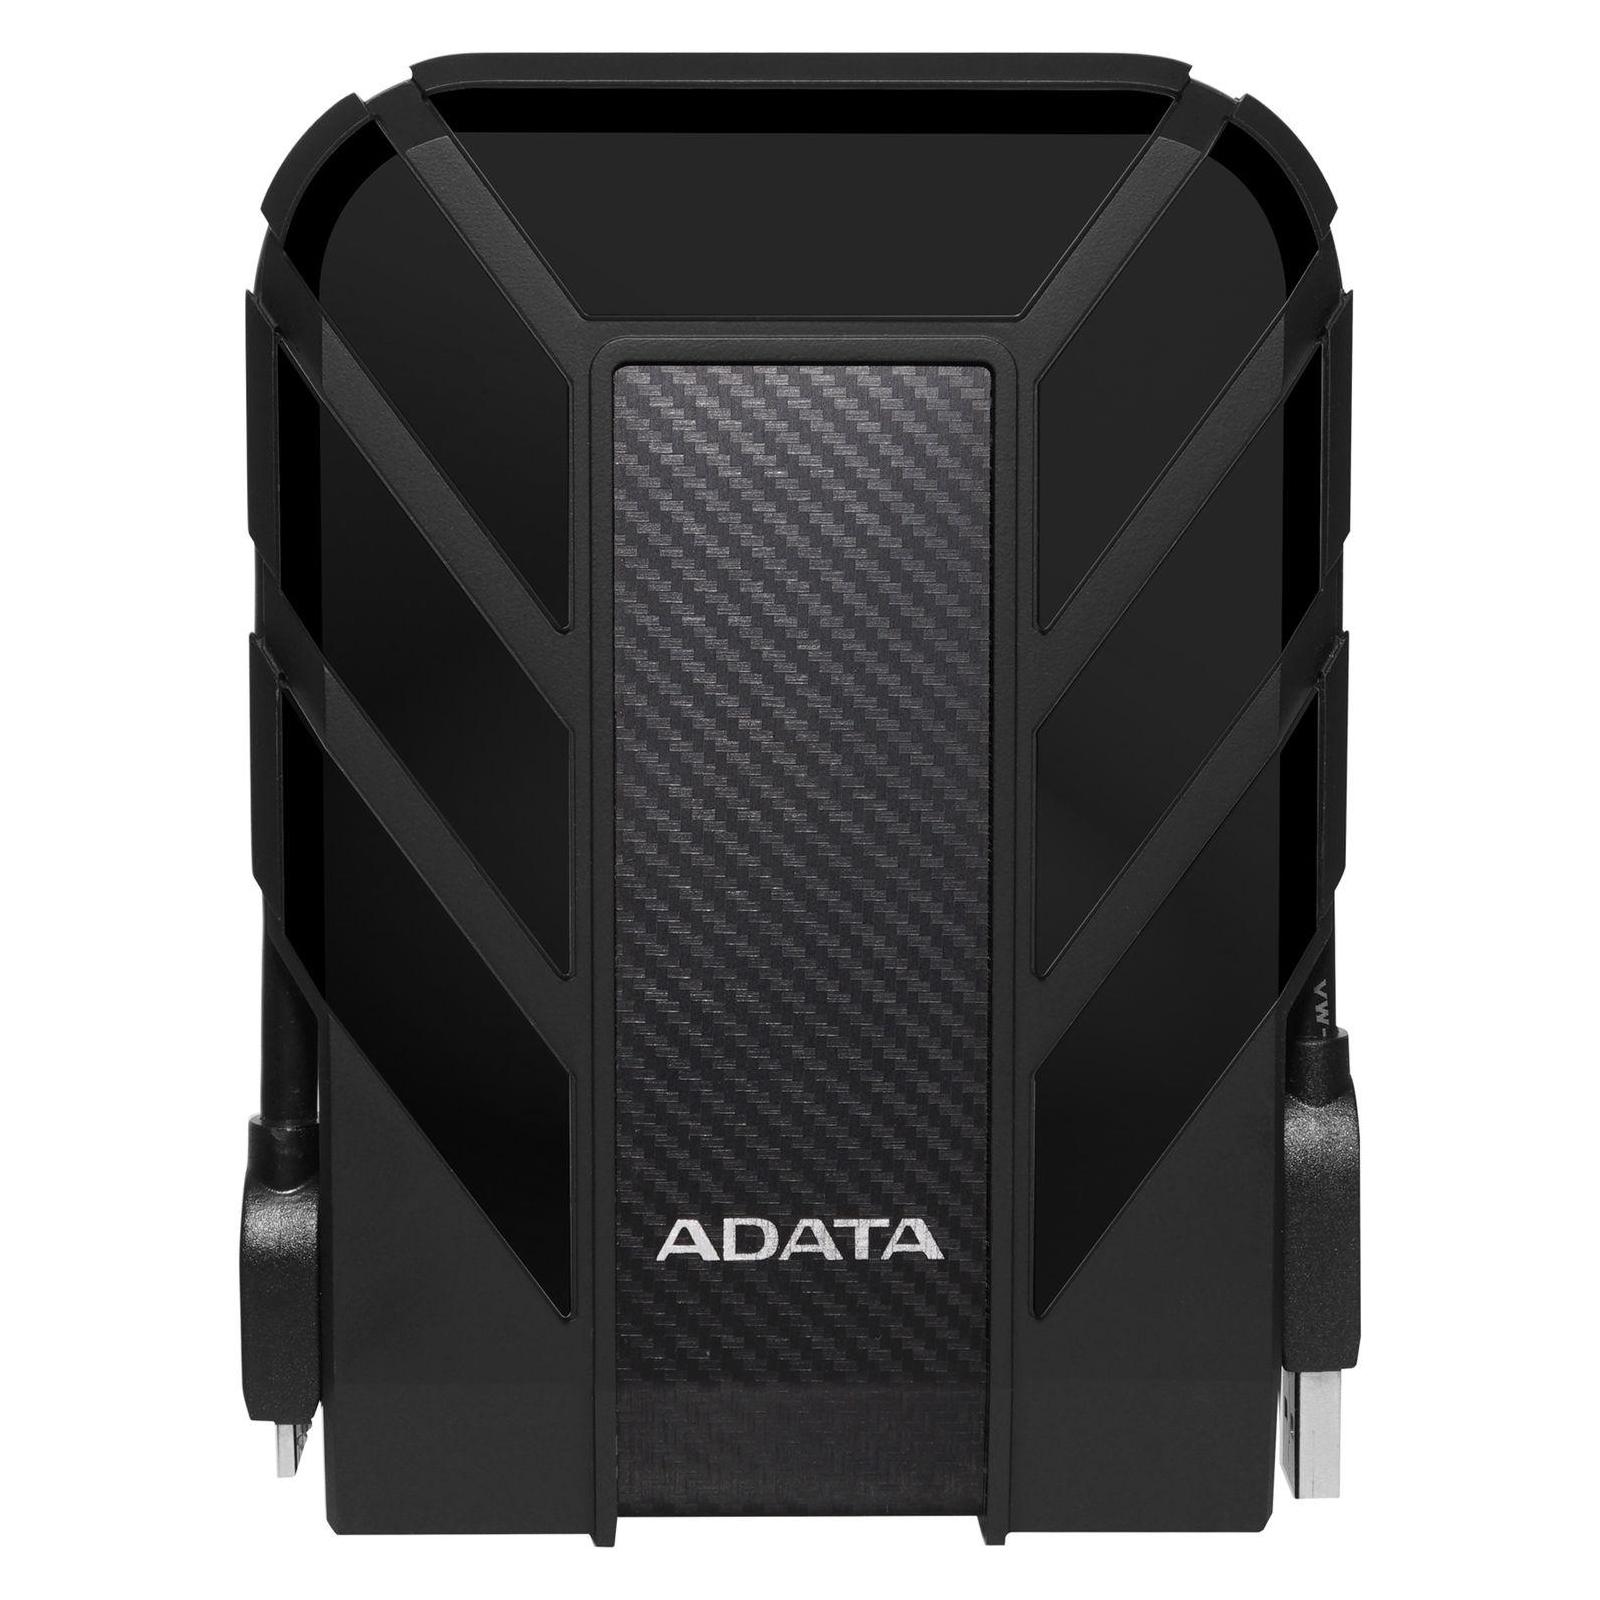 "Внешний жесткий диск 2.5"" 2TB ADATA (AHD710P-2TU31-CRD)"